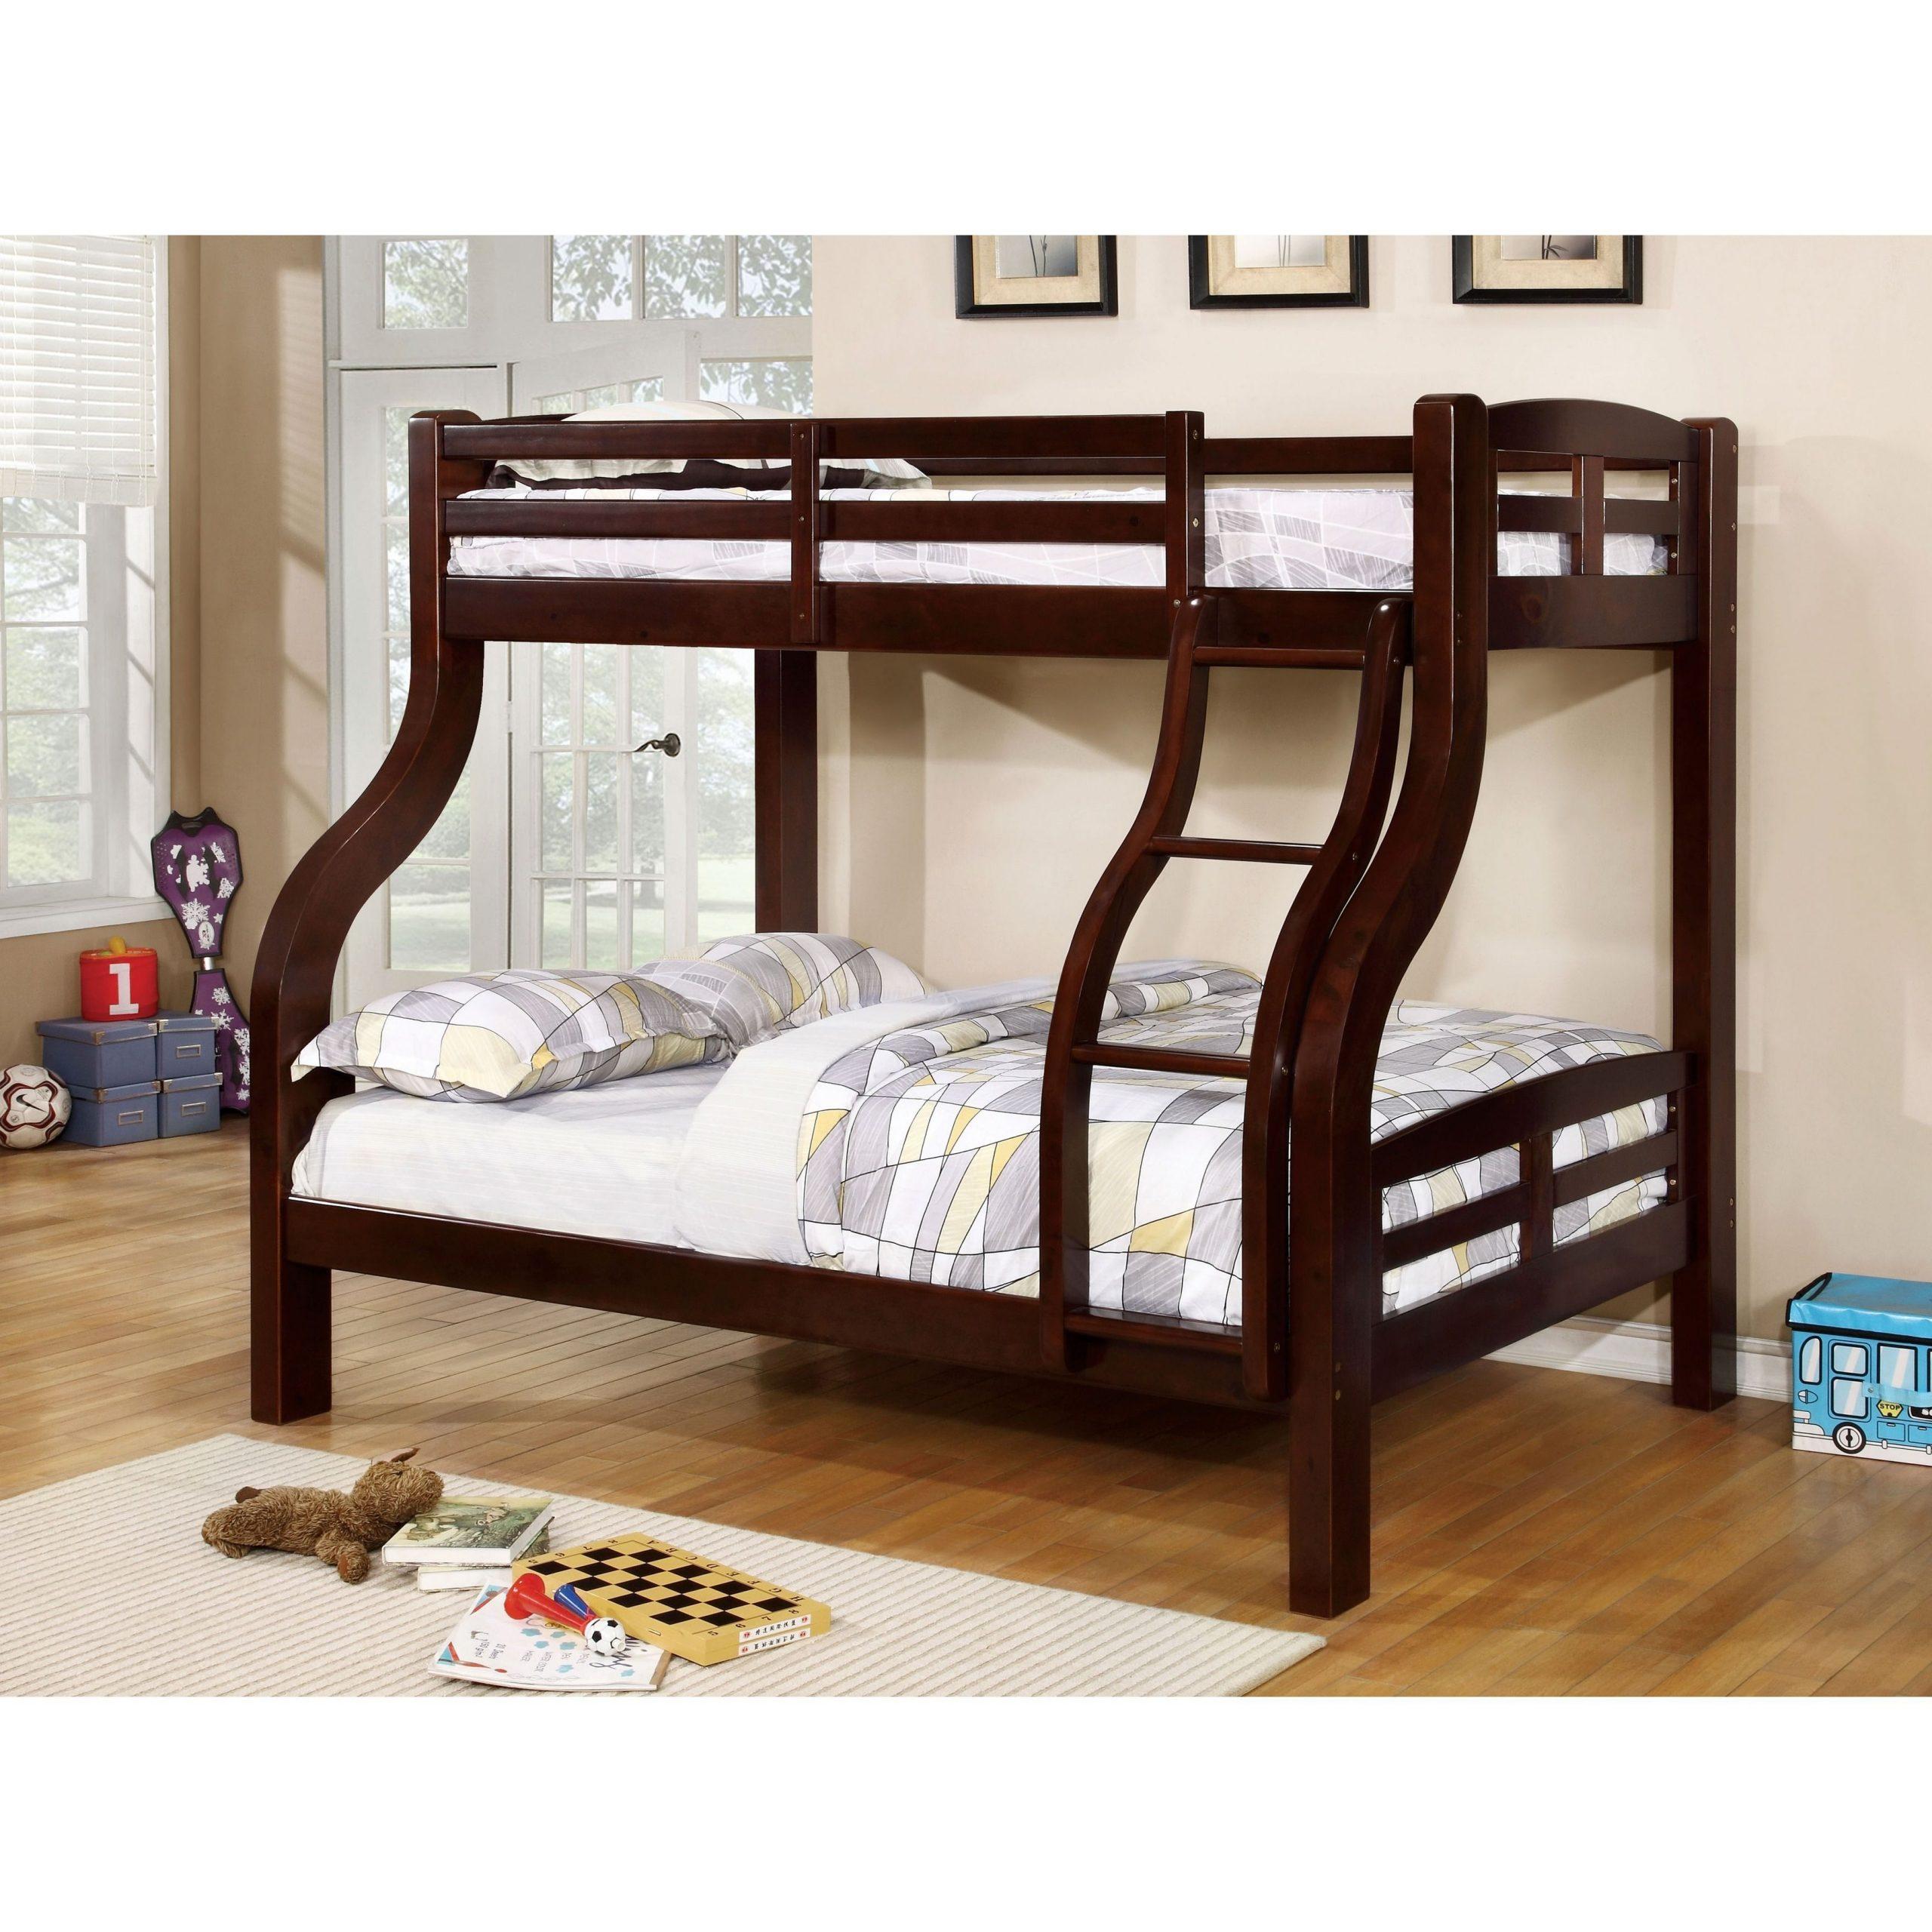 solpine twin full size dark walnut bed bunk standard distributors limited. Black Bedroom Furniture Sets. Home Design Ideas